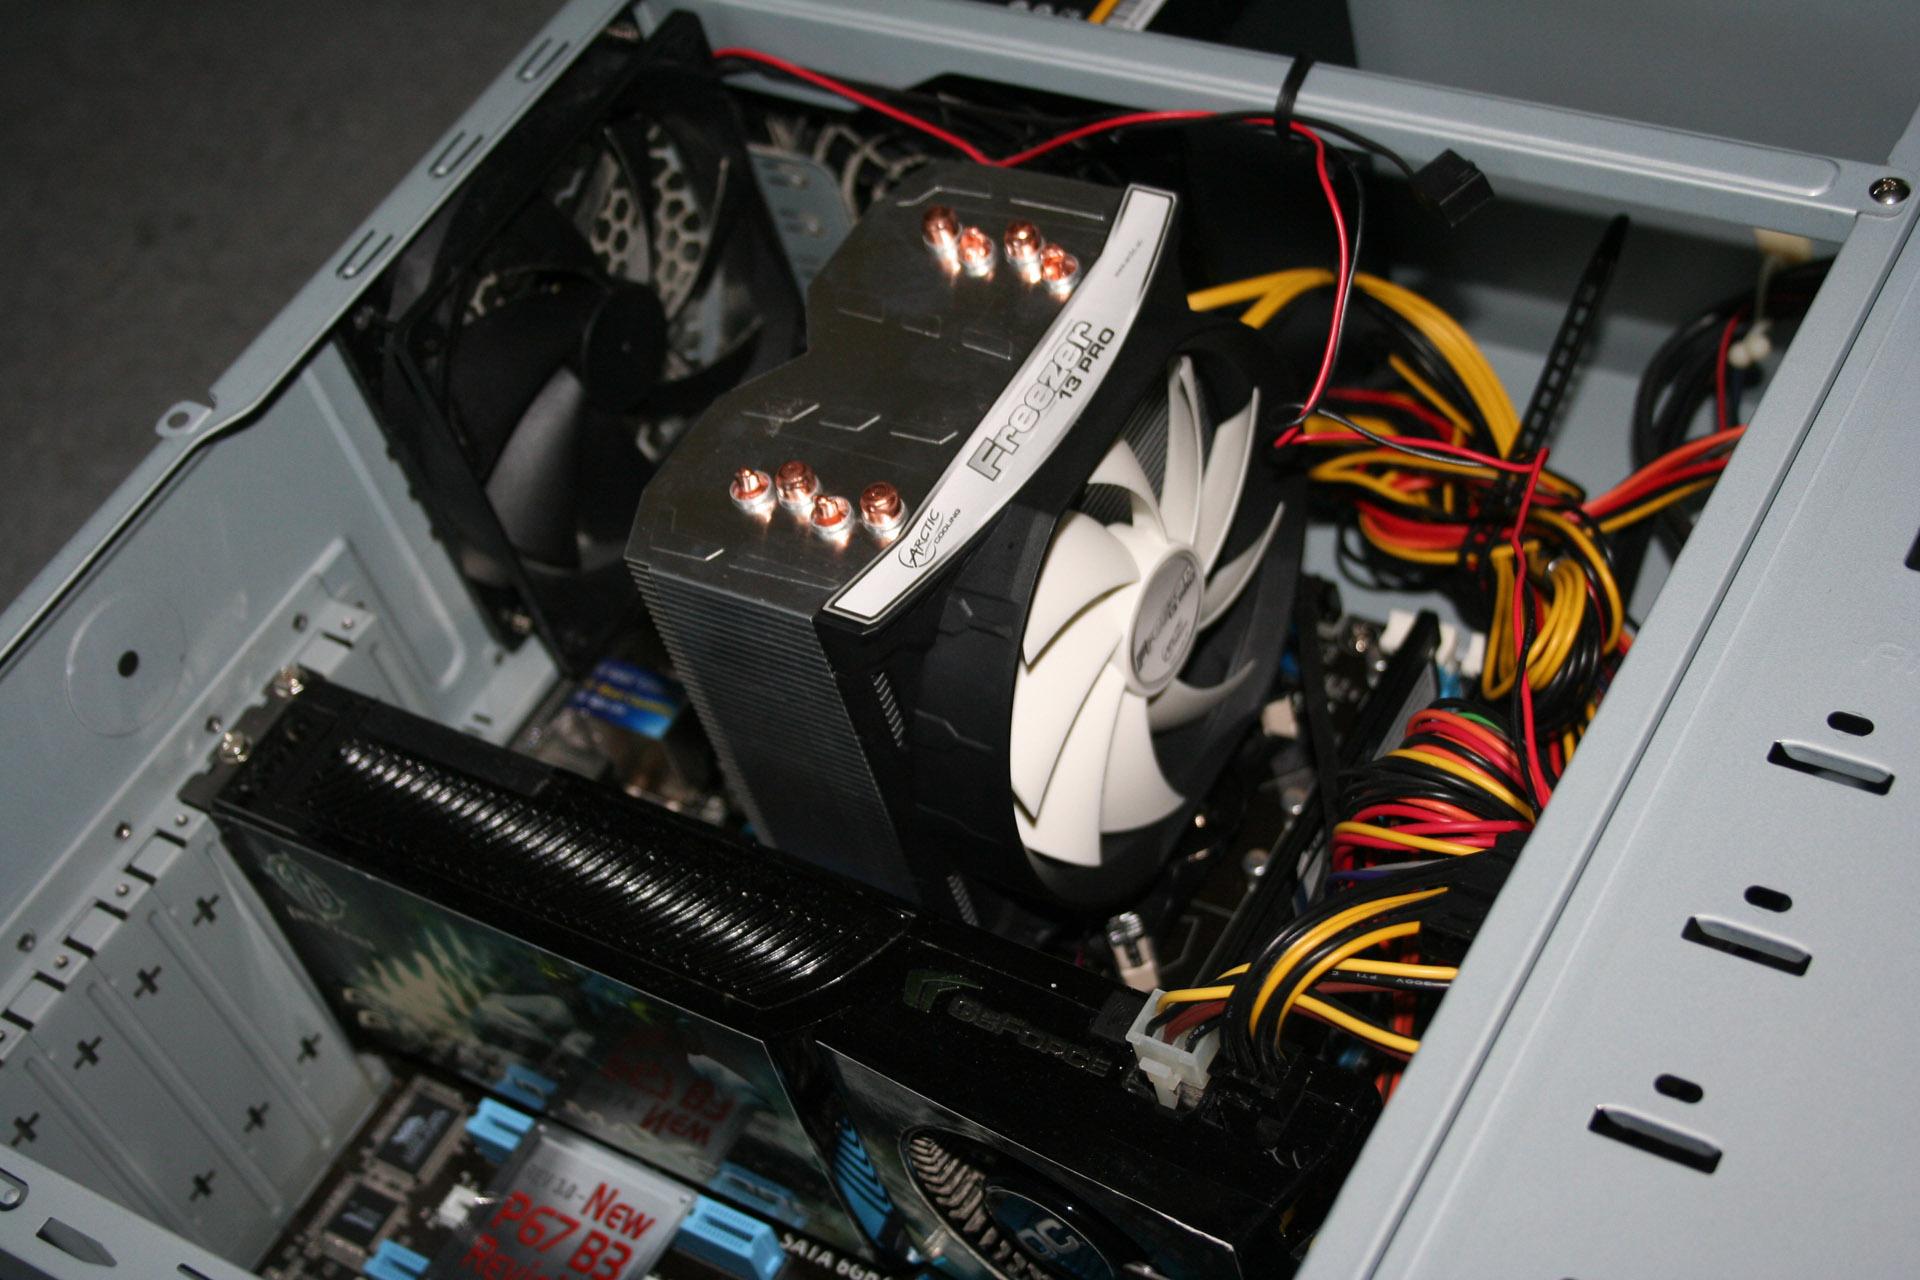 File:Arctic Freezer 13 Pro.jpg - Wikipedia